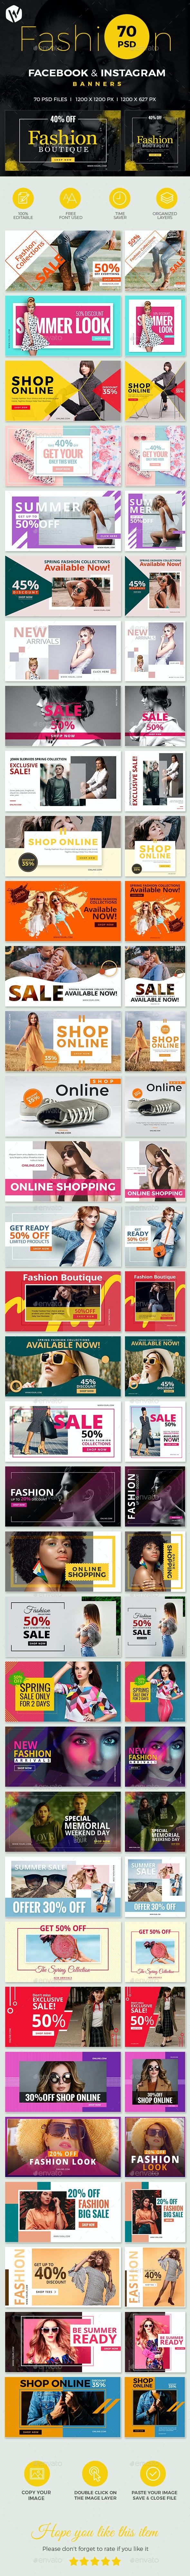 Facebook & Instagram Fashion Banners - Social Media Web Elements